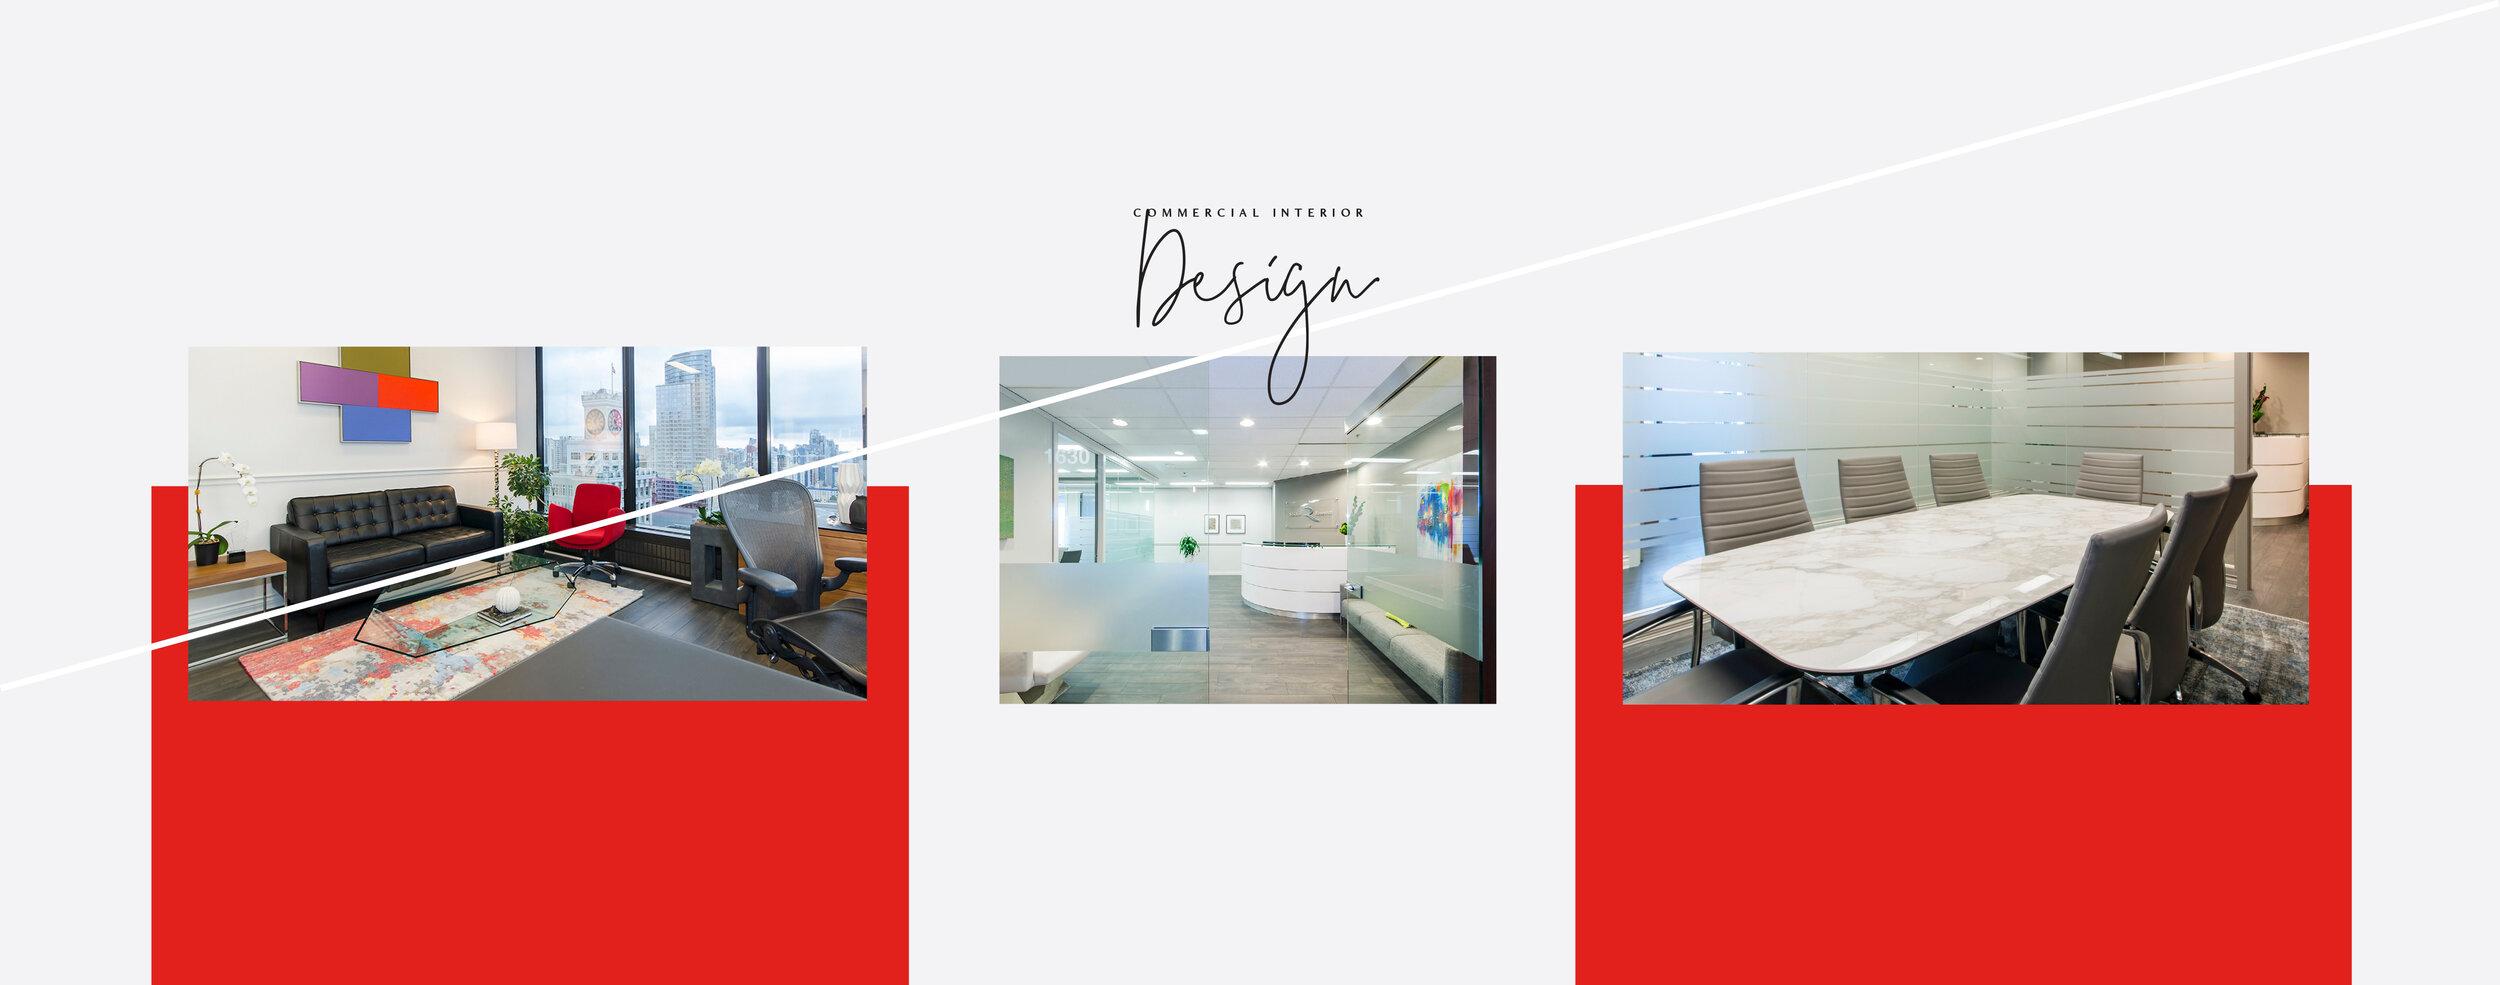 vancouver interior design 3.jpg